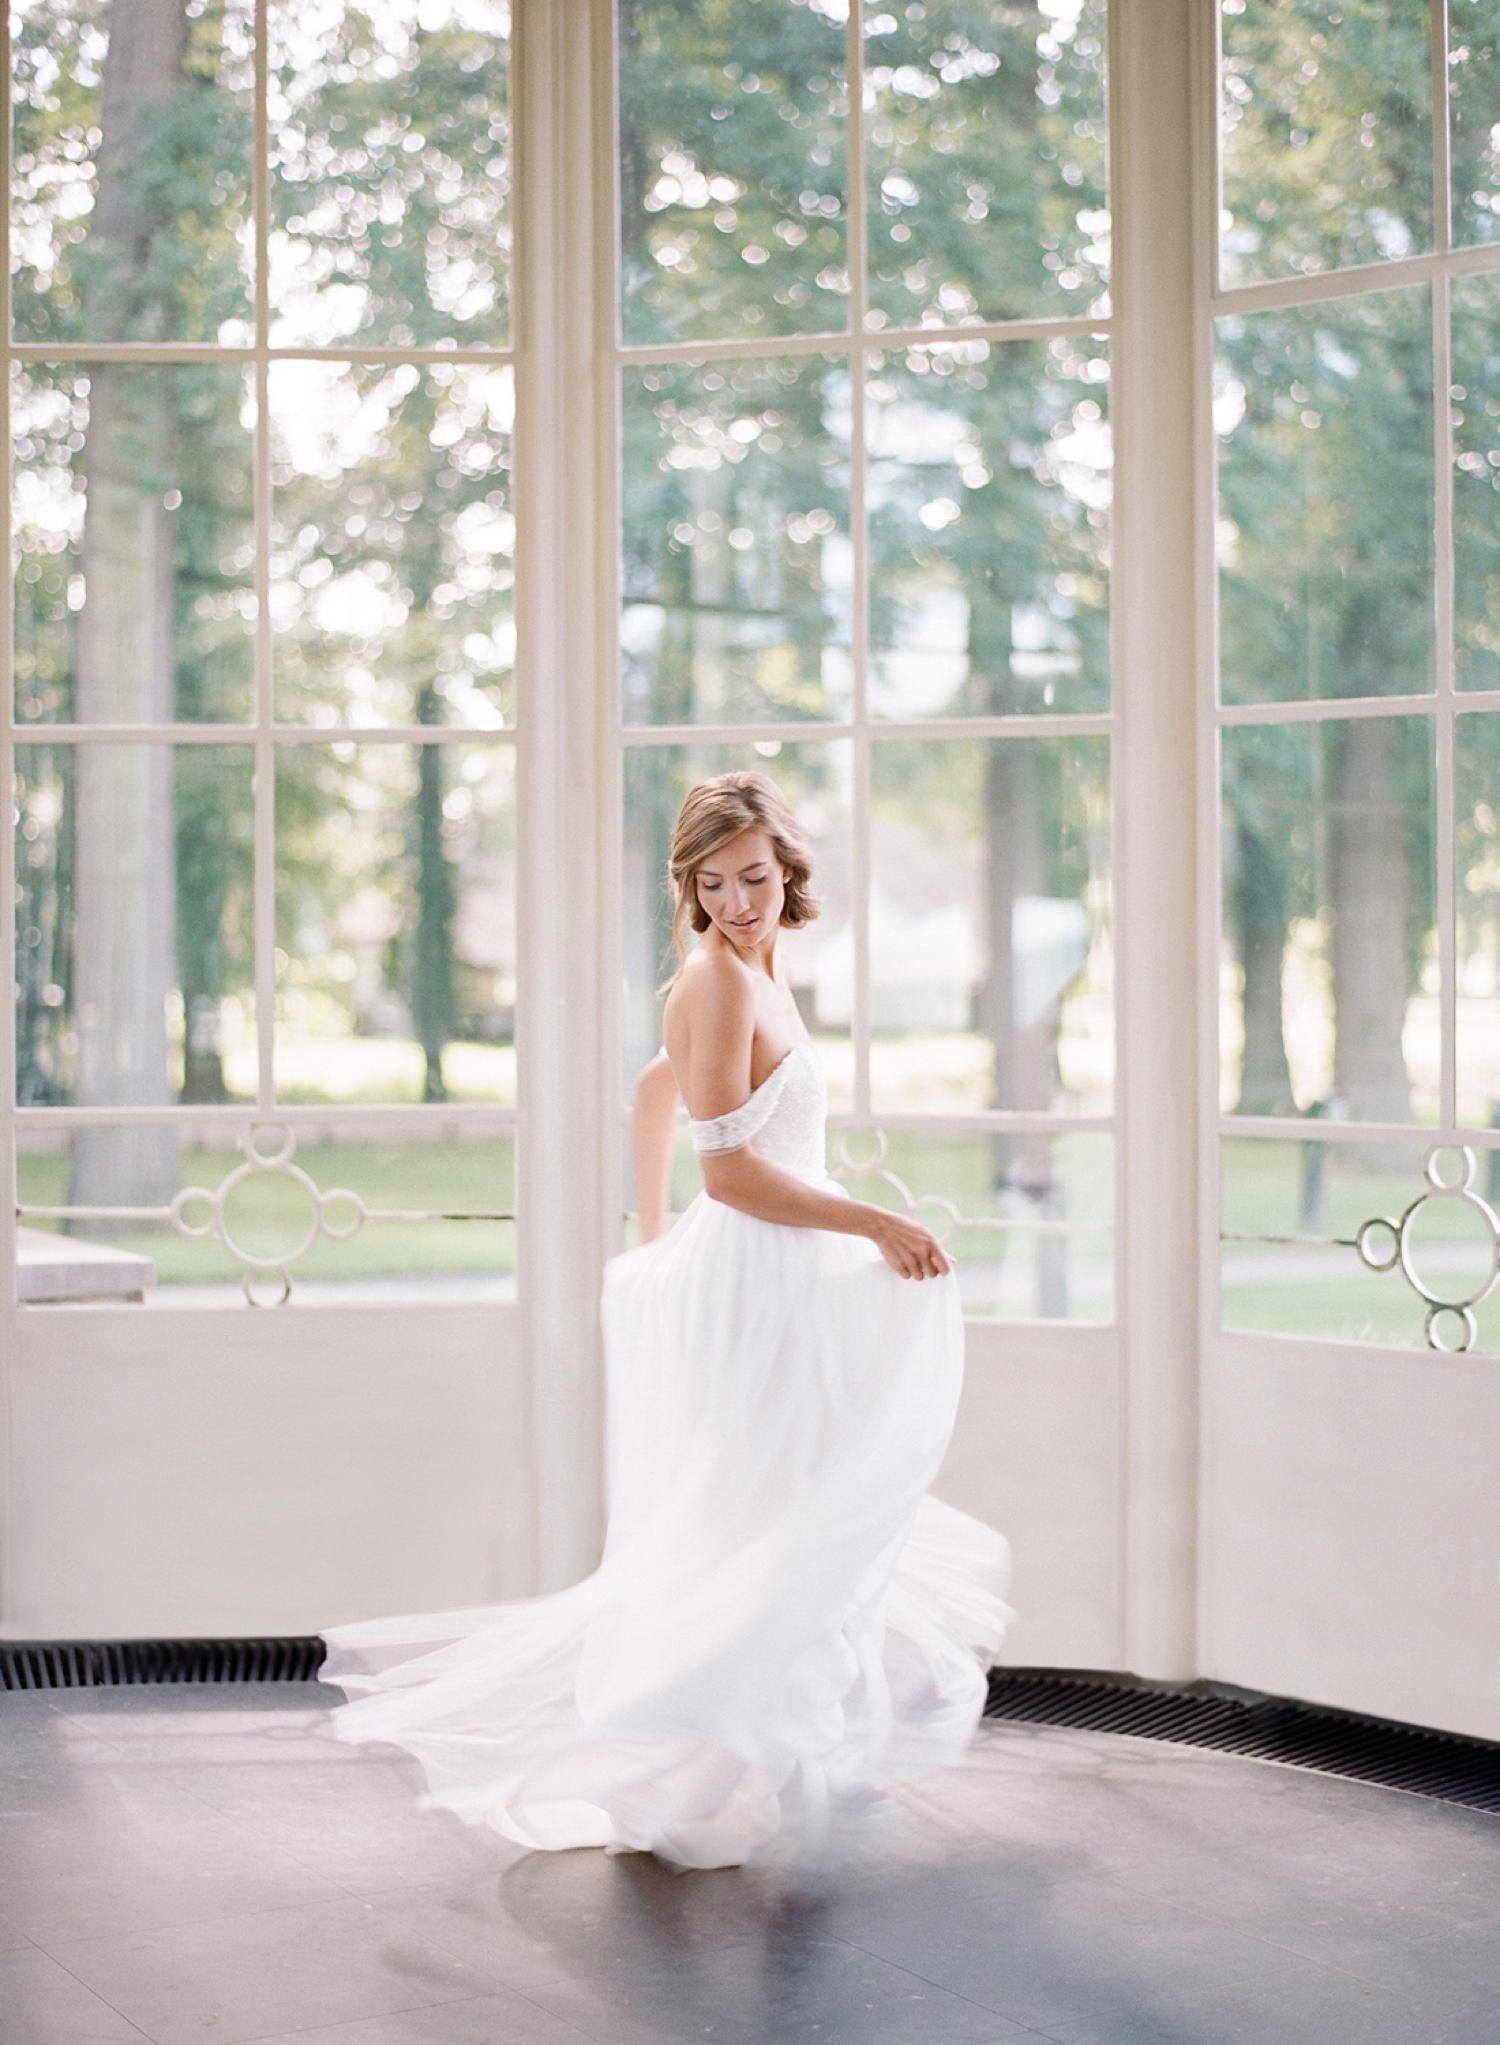 high end wedding inspiration, the netherlands